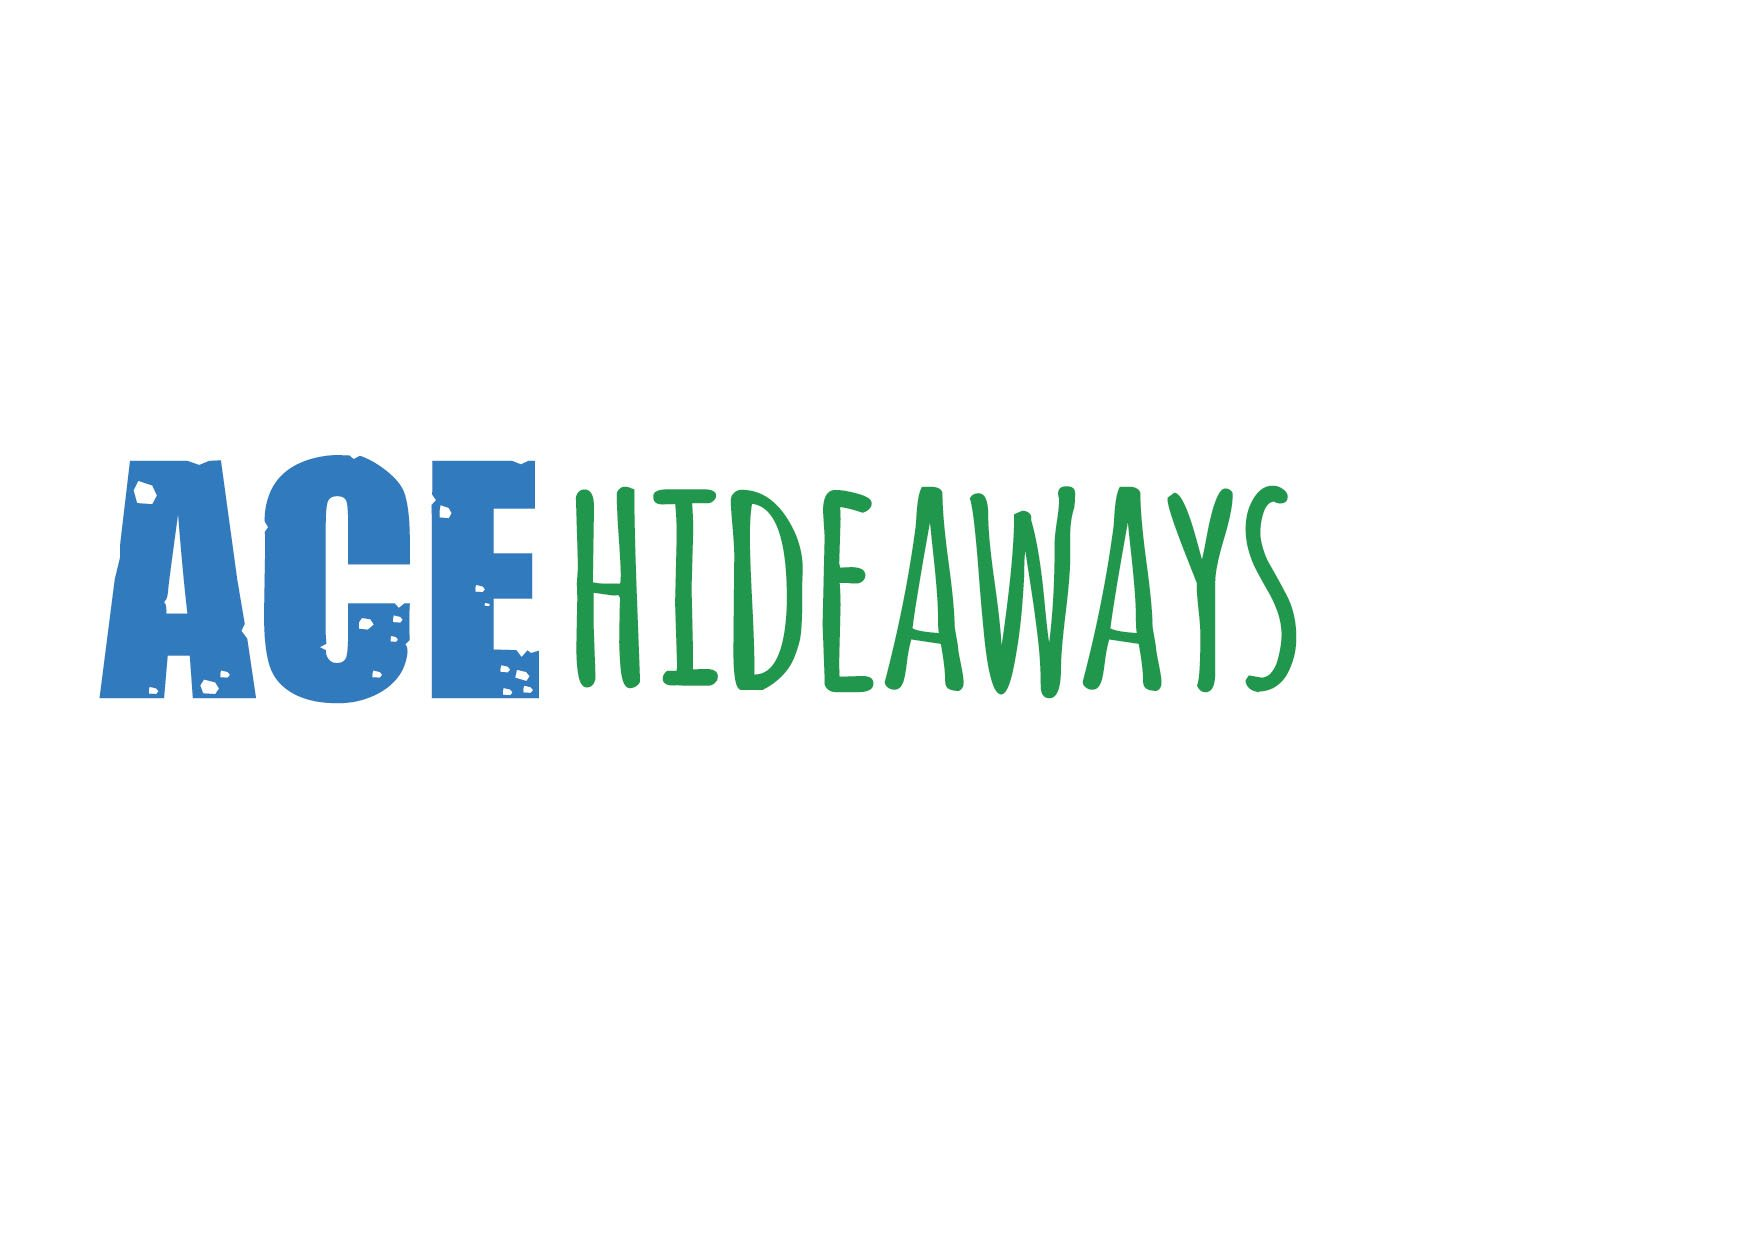 Ace Hideaways